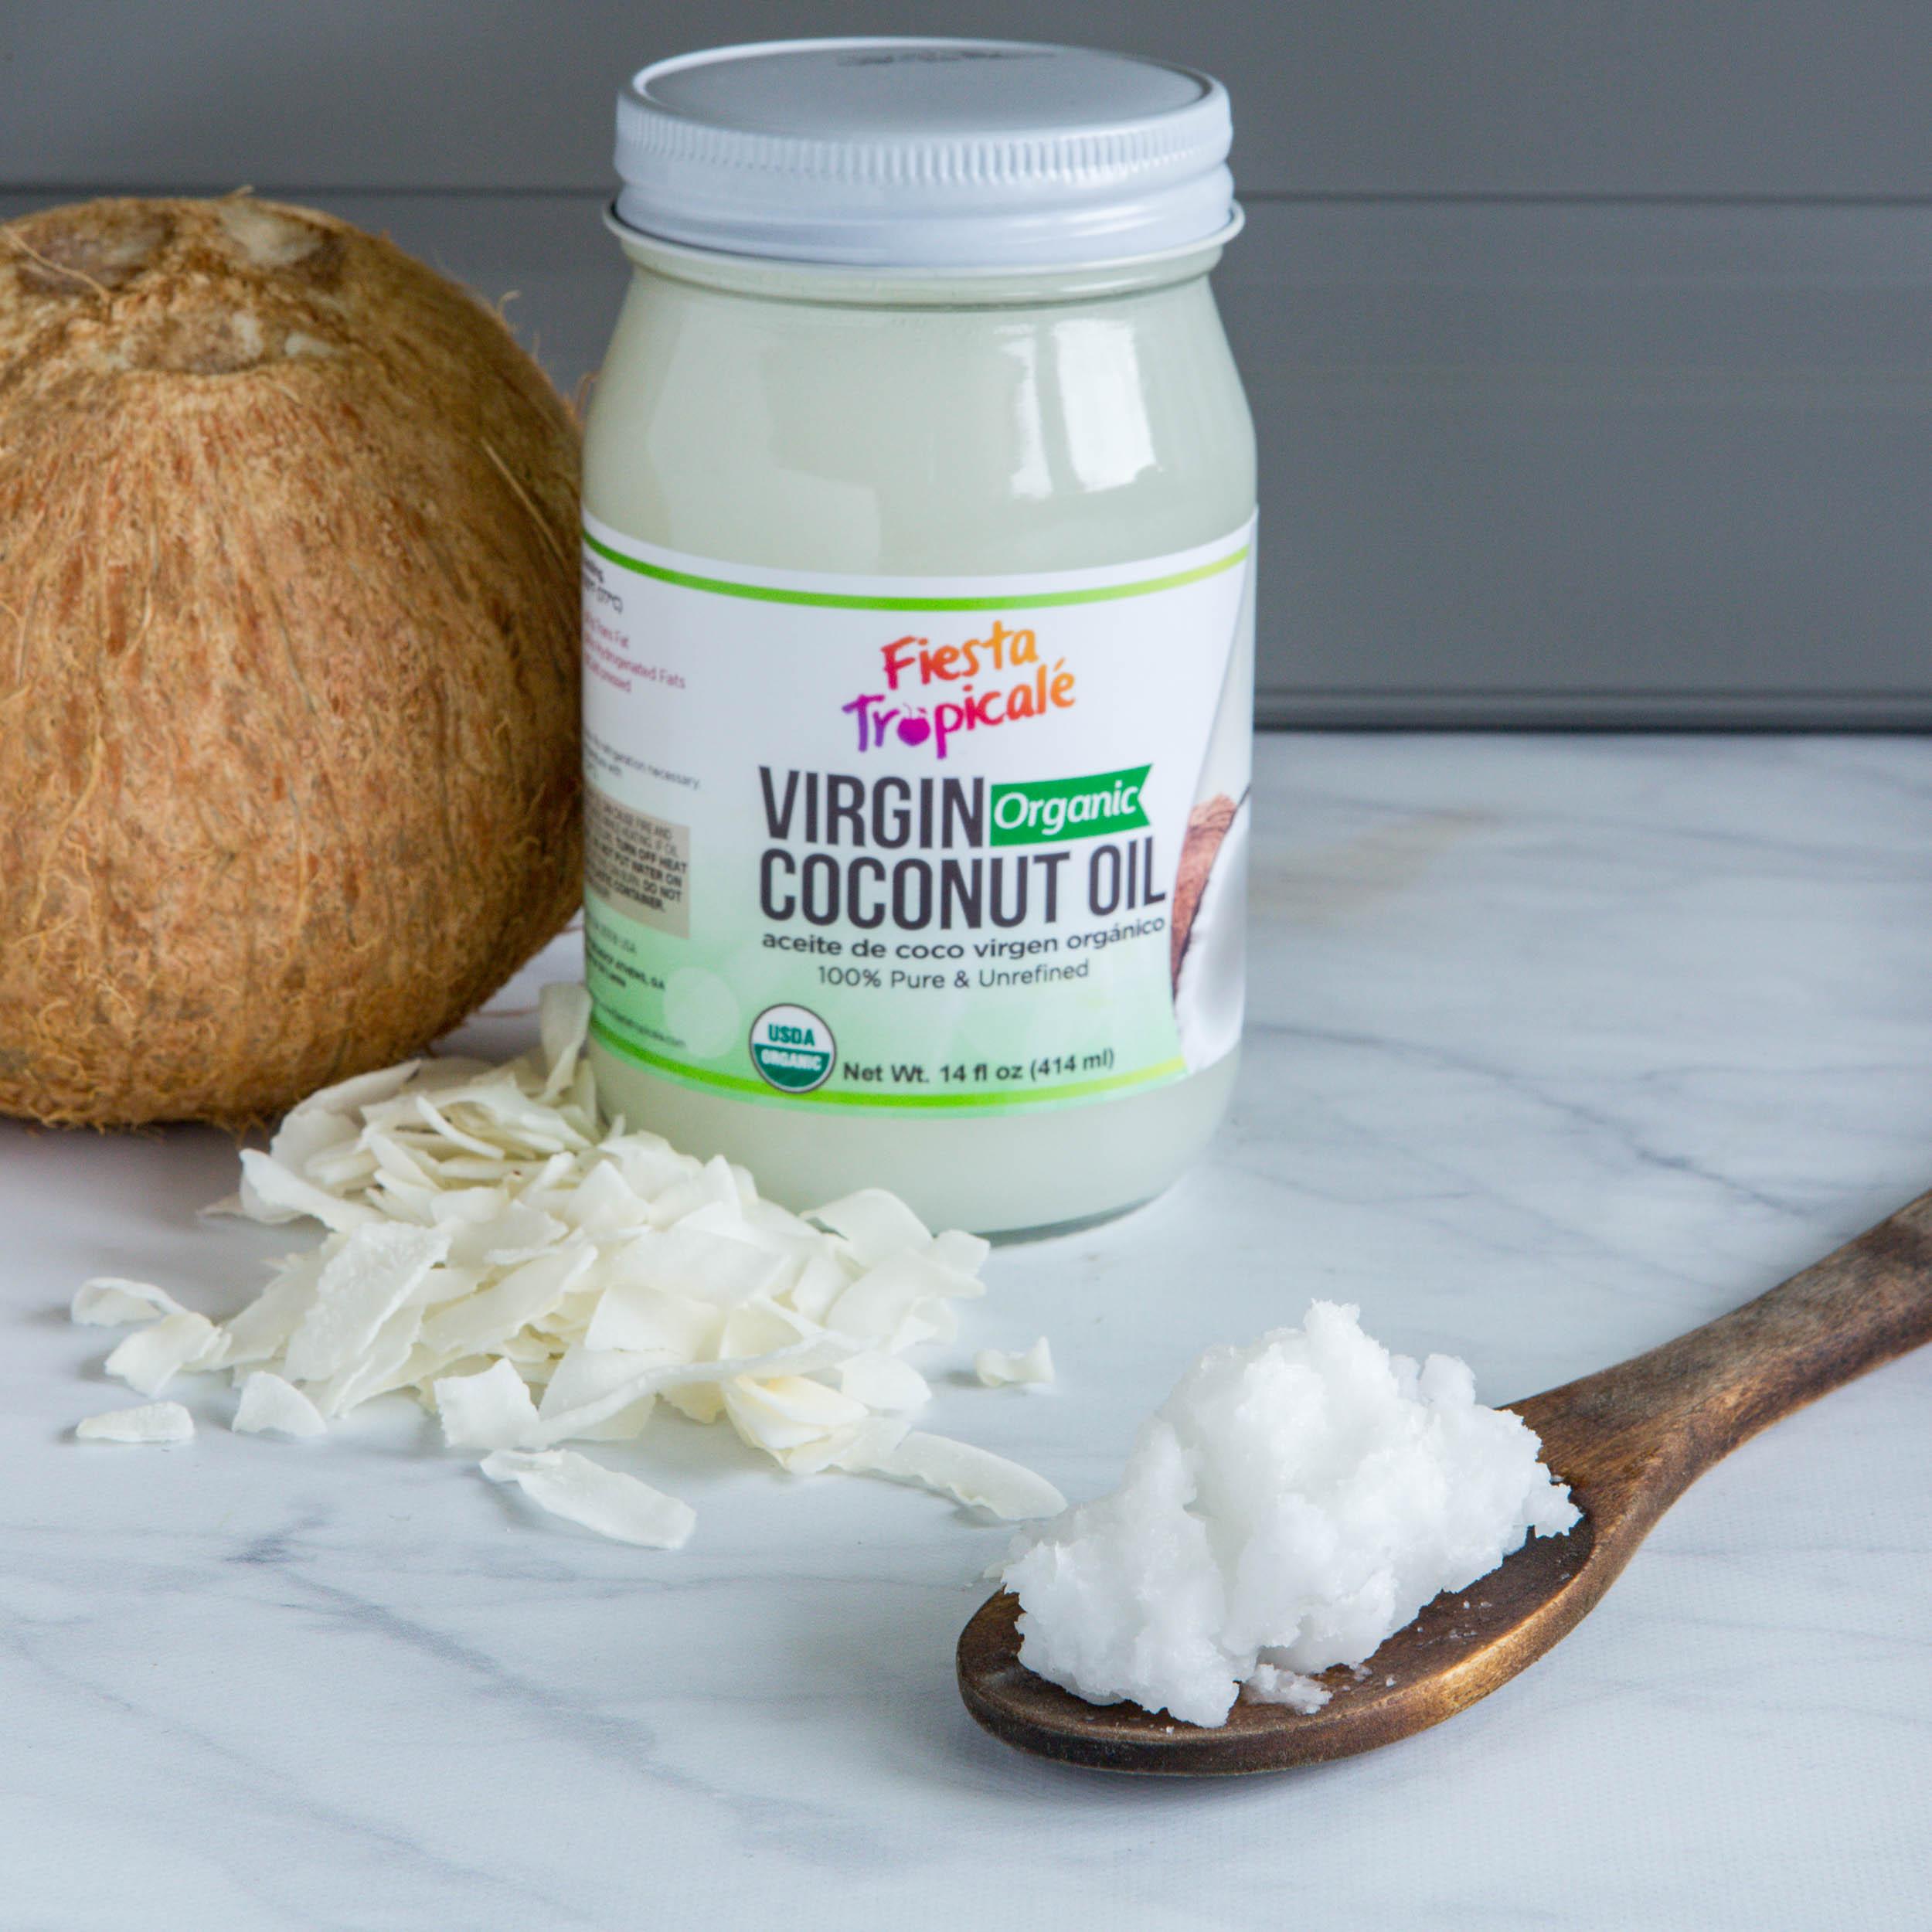 Fiesta Tropicale Organic Virgin Coconut Oil